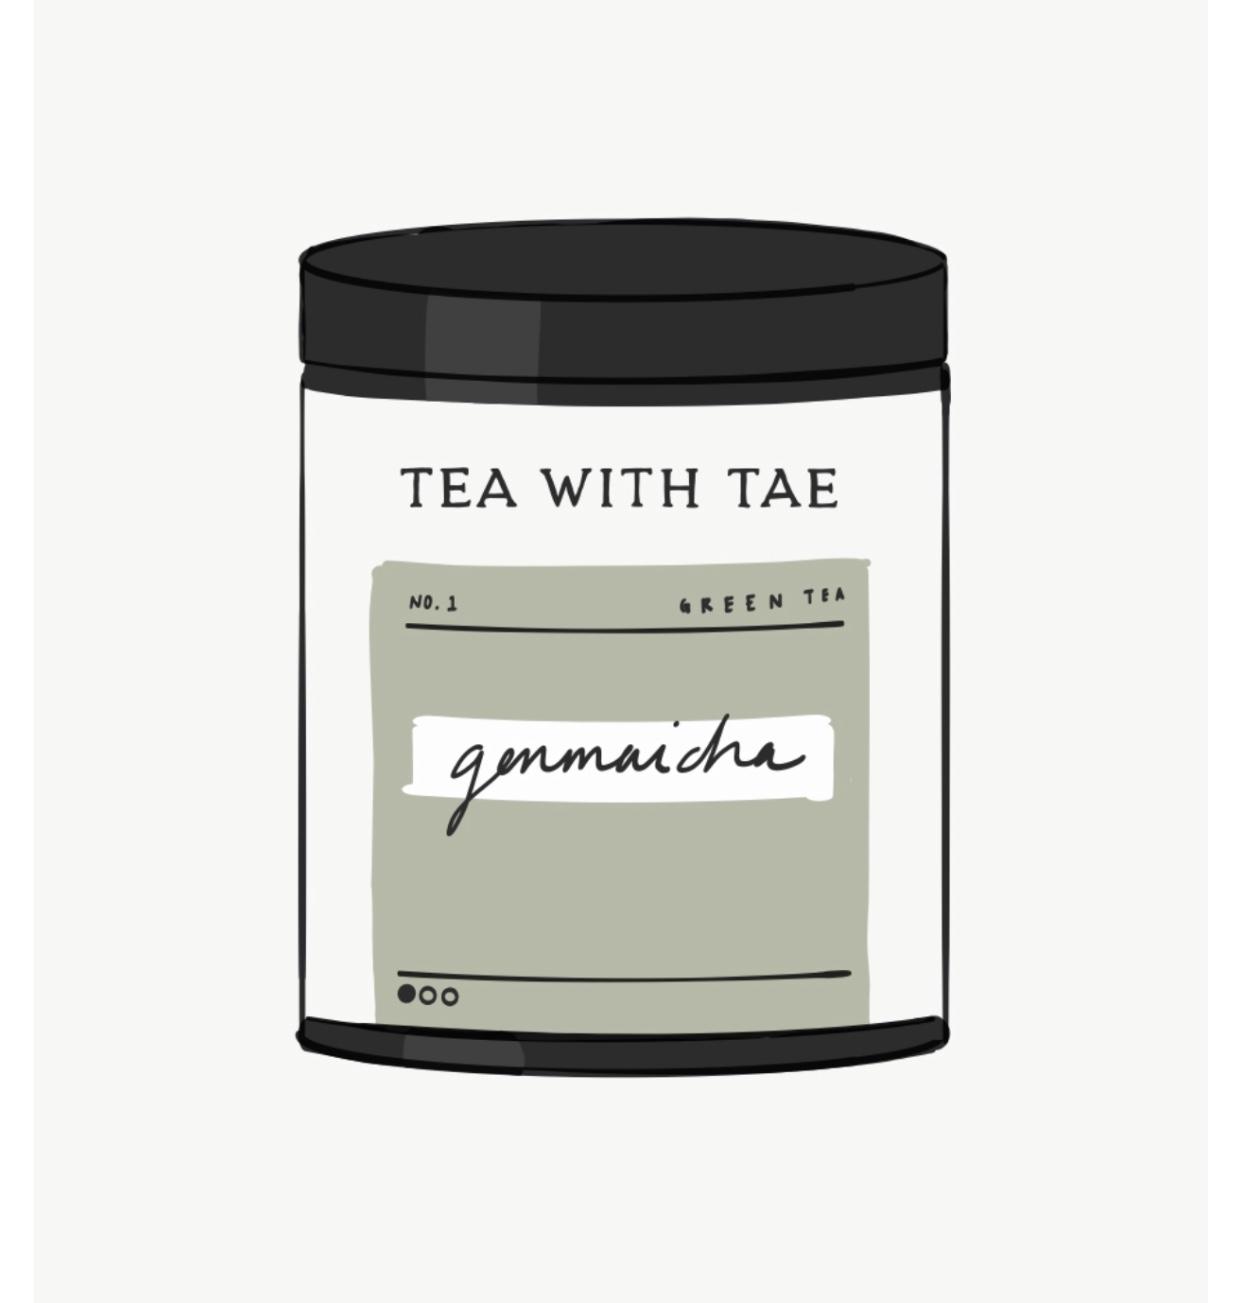 Basics of green tea